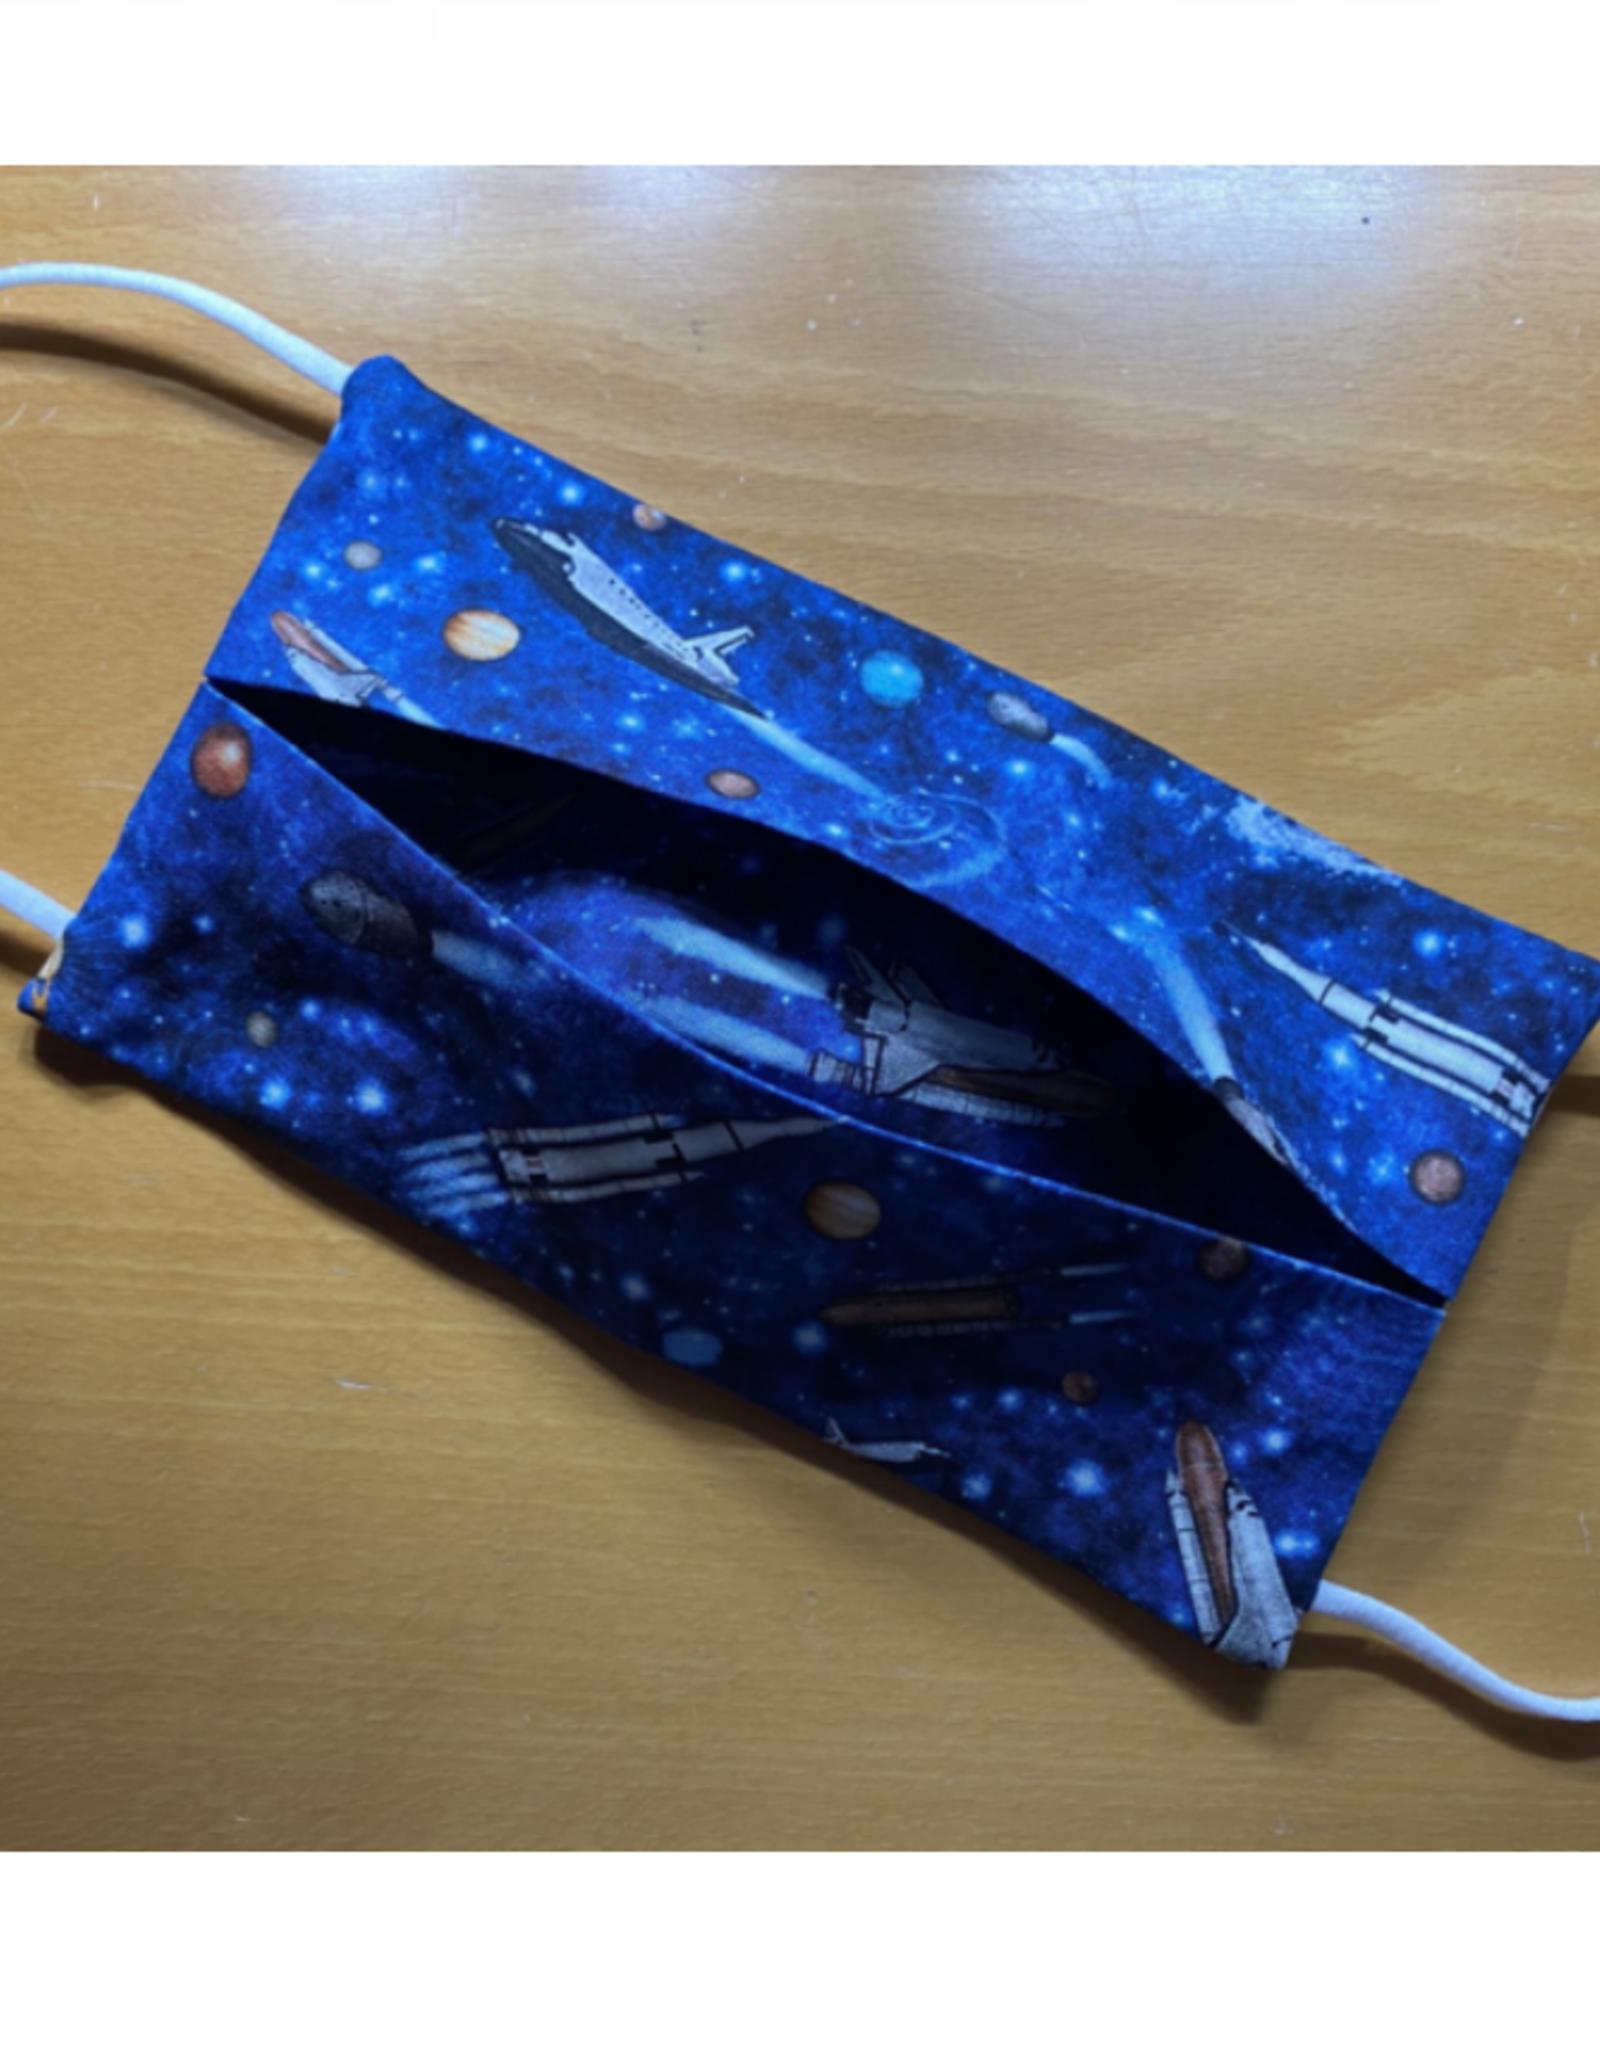 Mondmasker - Raket Blauw - Enveloppe